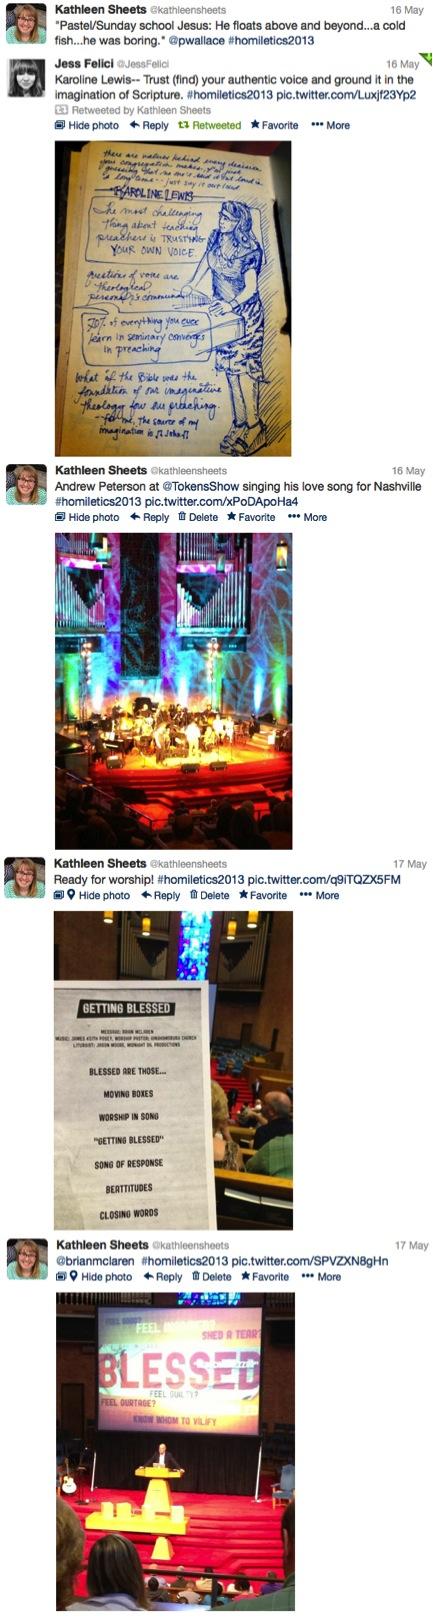 Festival of Homiletics Tweets 7